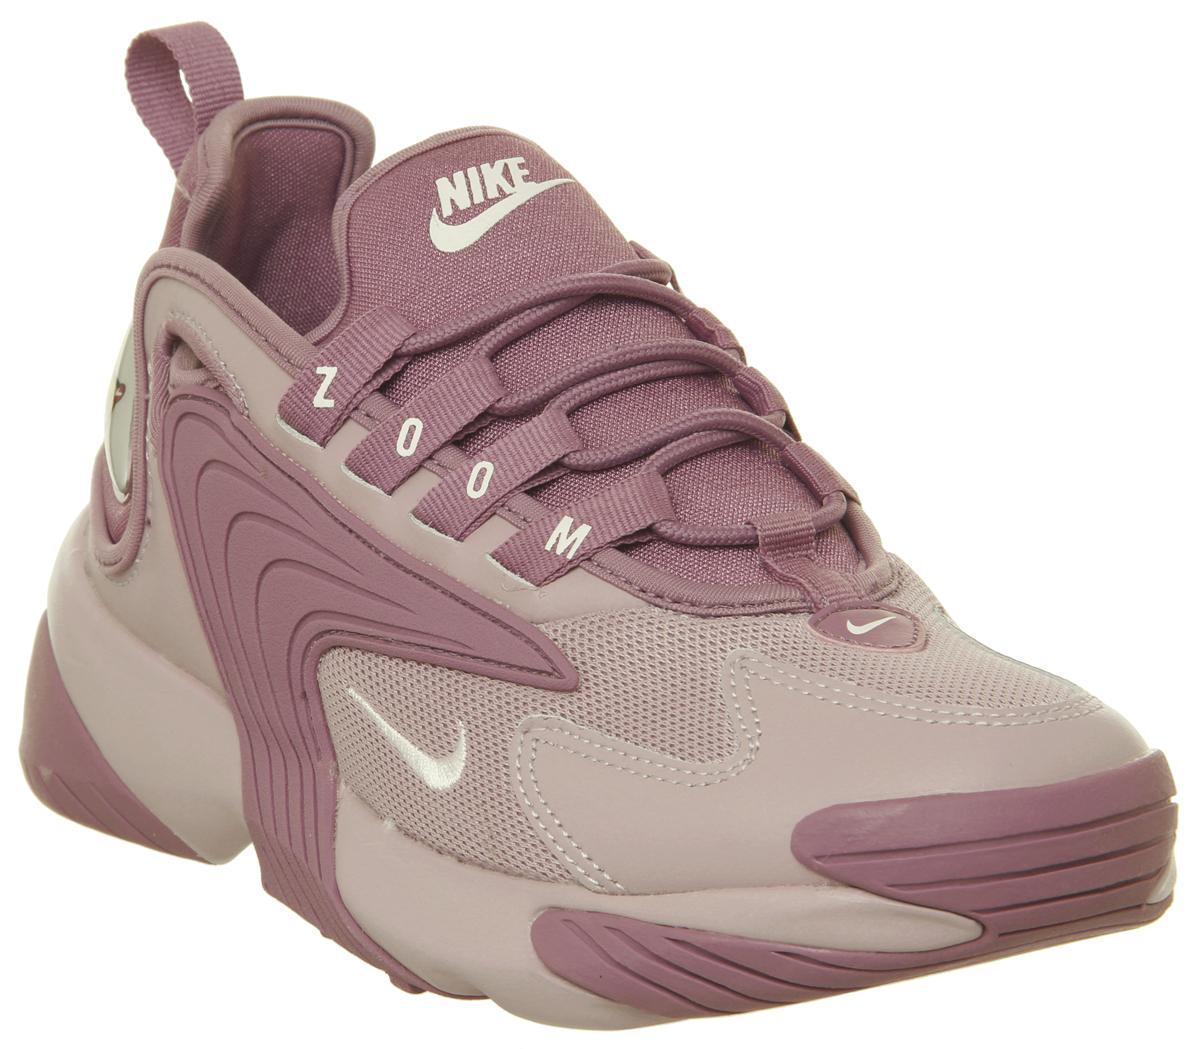 Nike Zoom 2K Trainers Plum Dust Pale